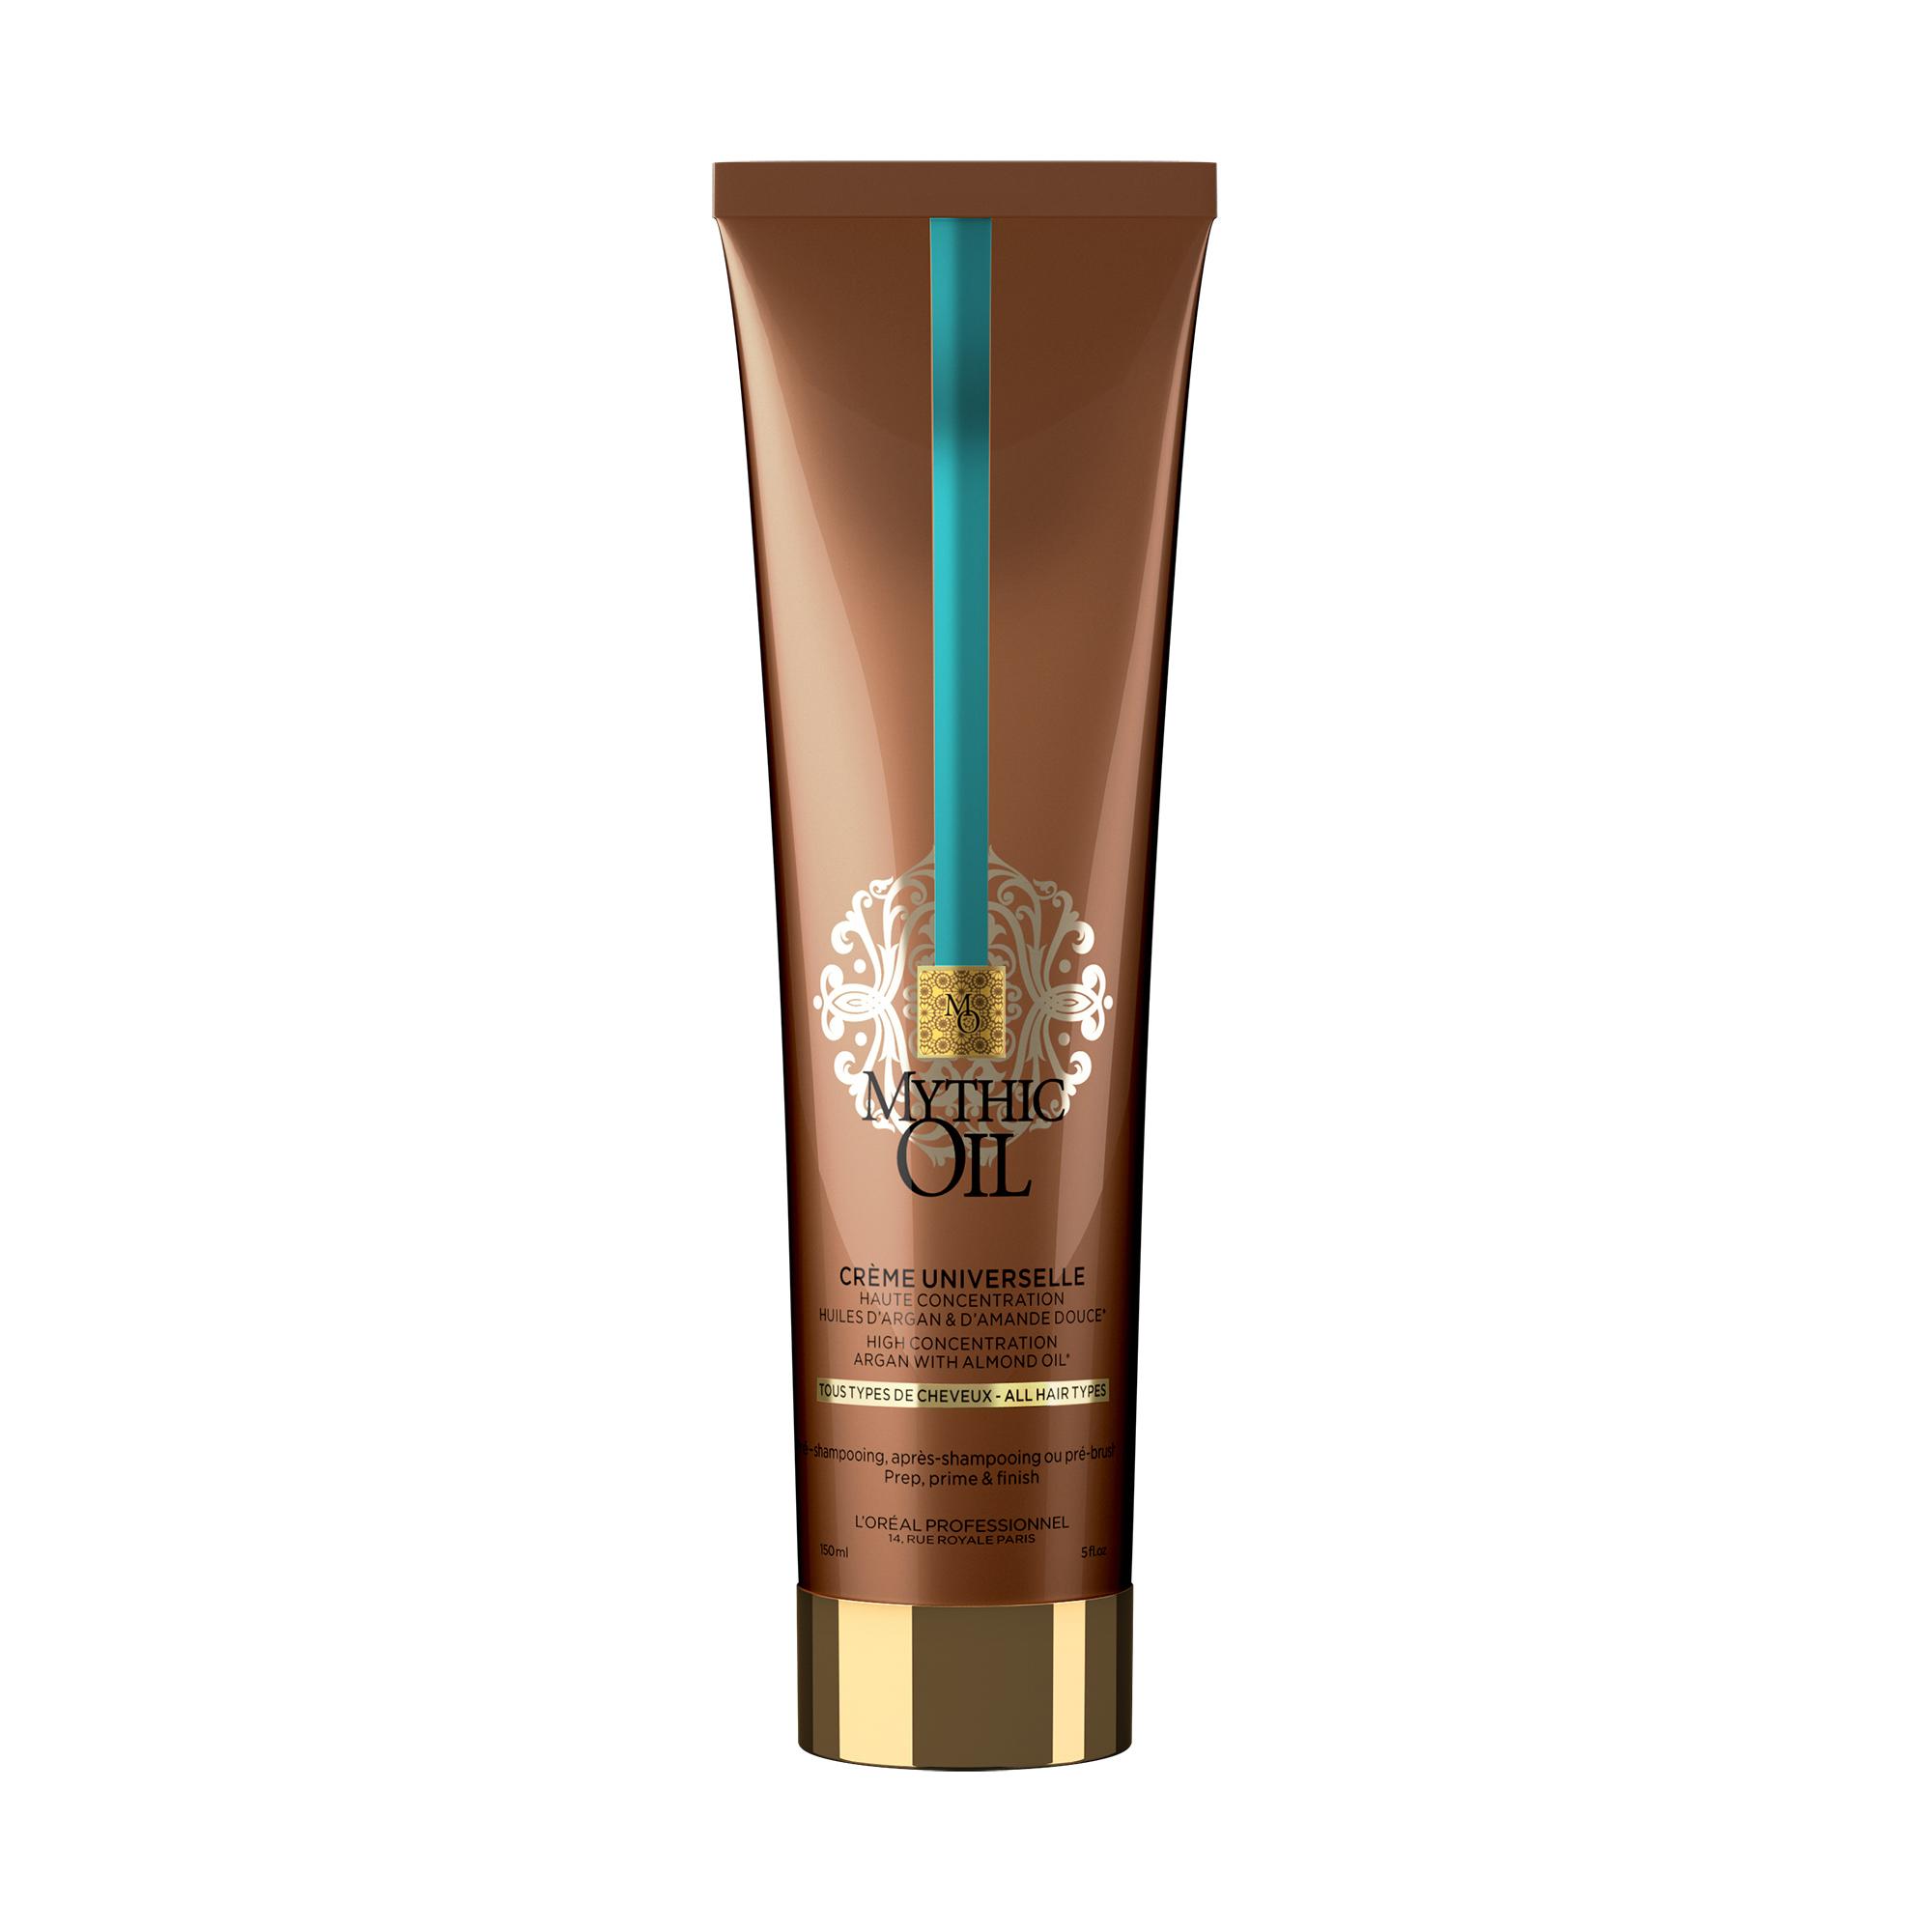 Mythic Oil Crème Universelle Pre-Shampoo 150ml